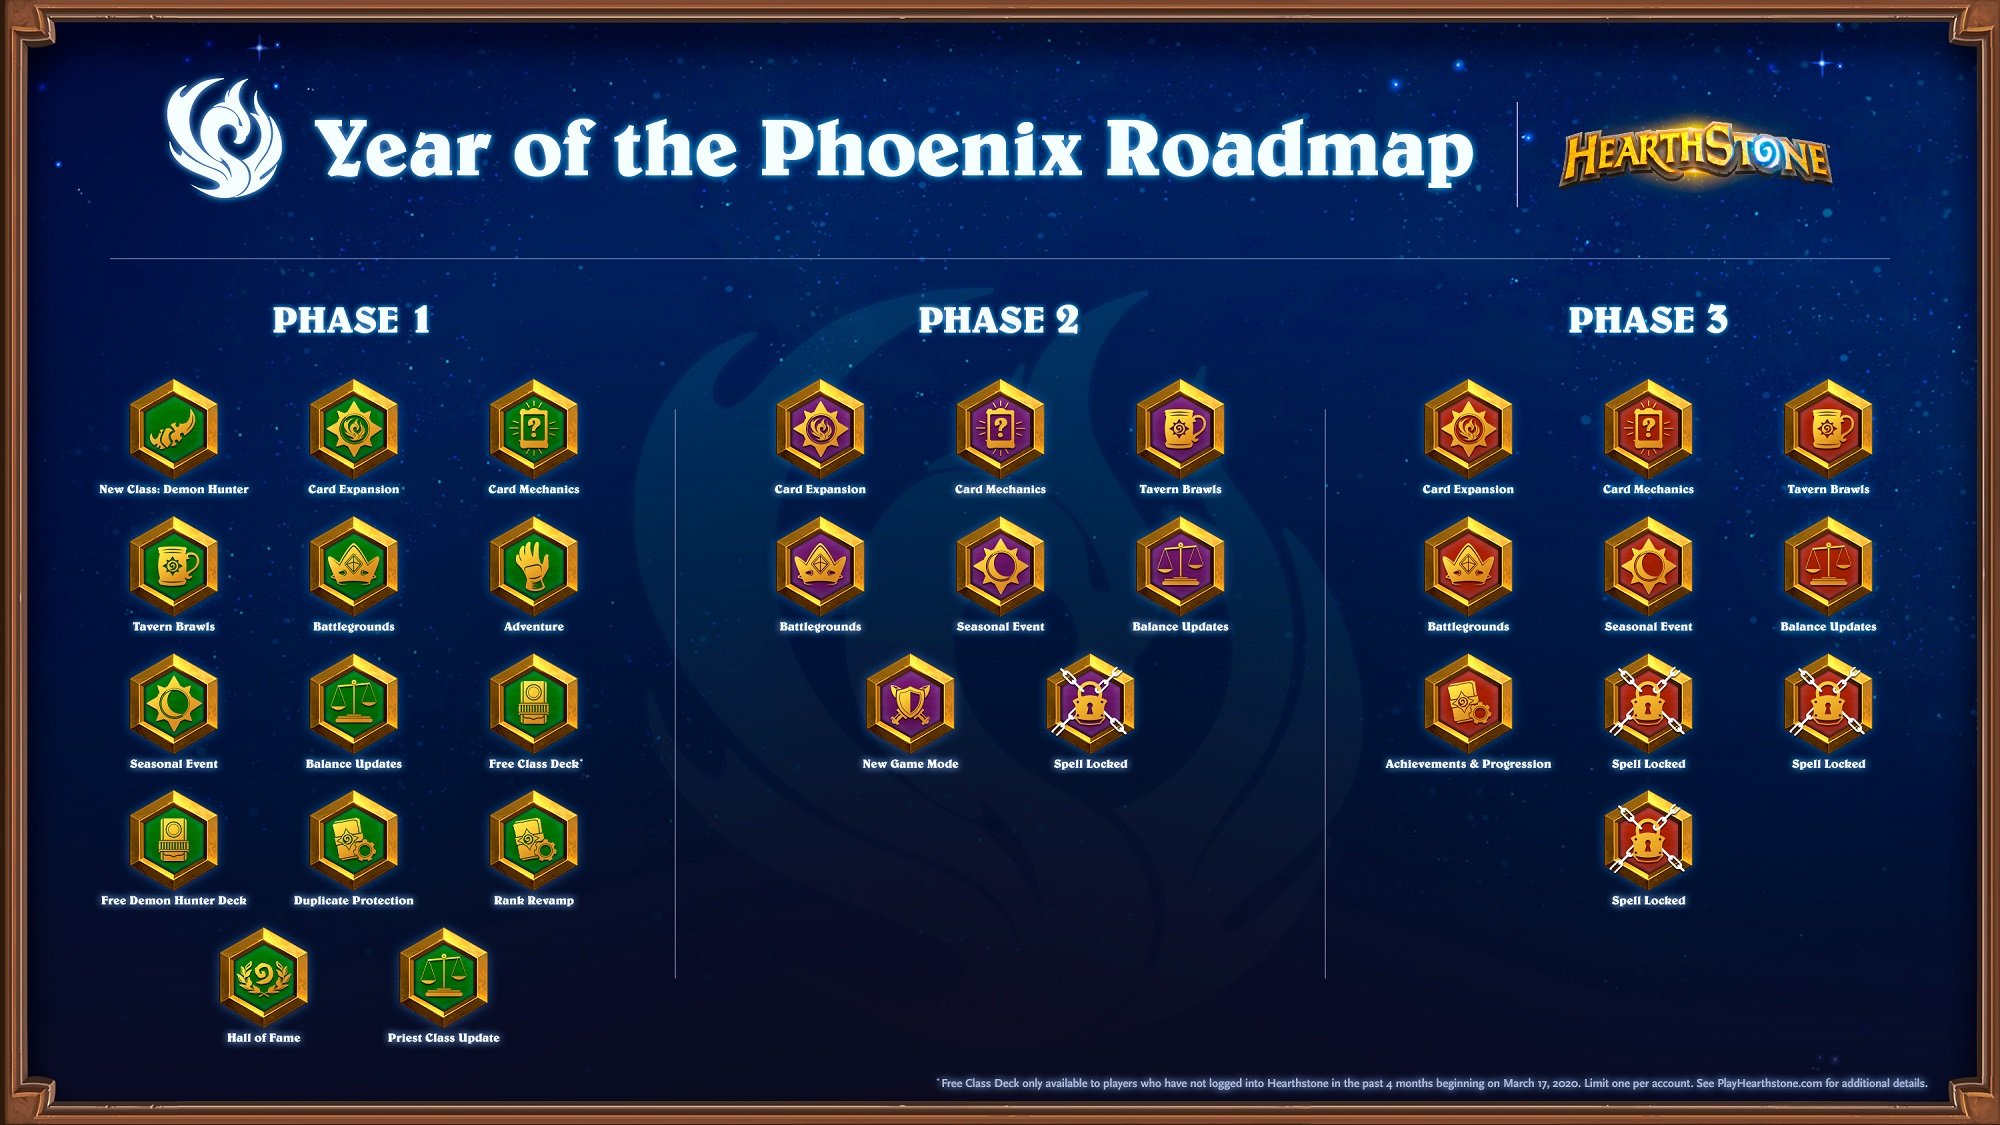 Year of Phoenix